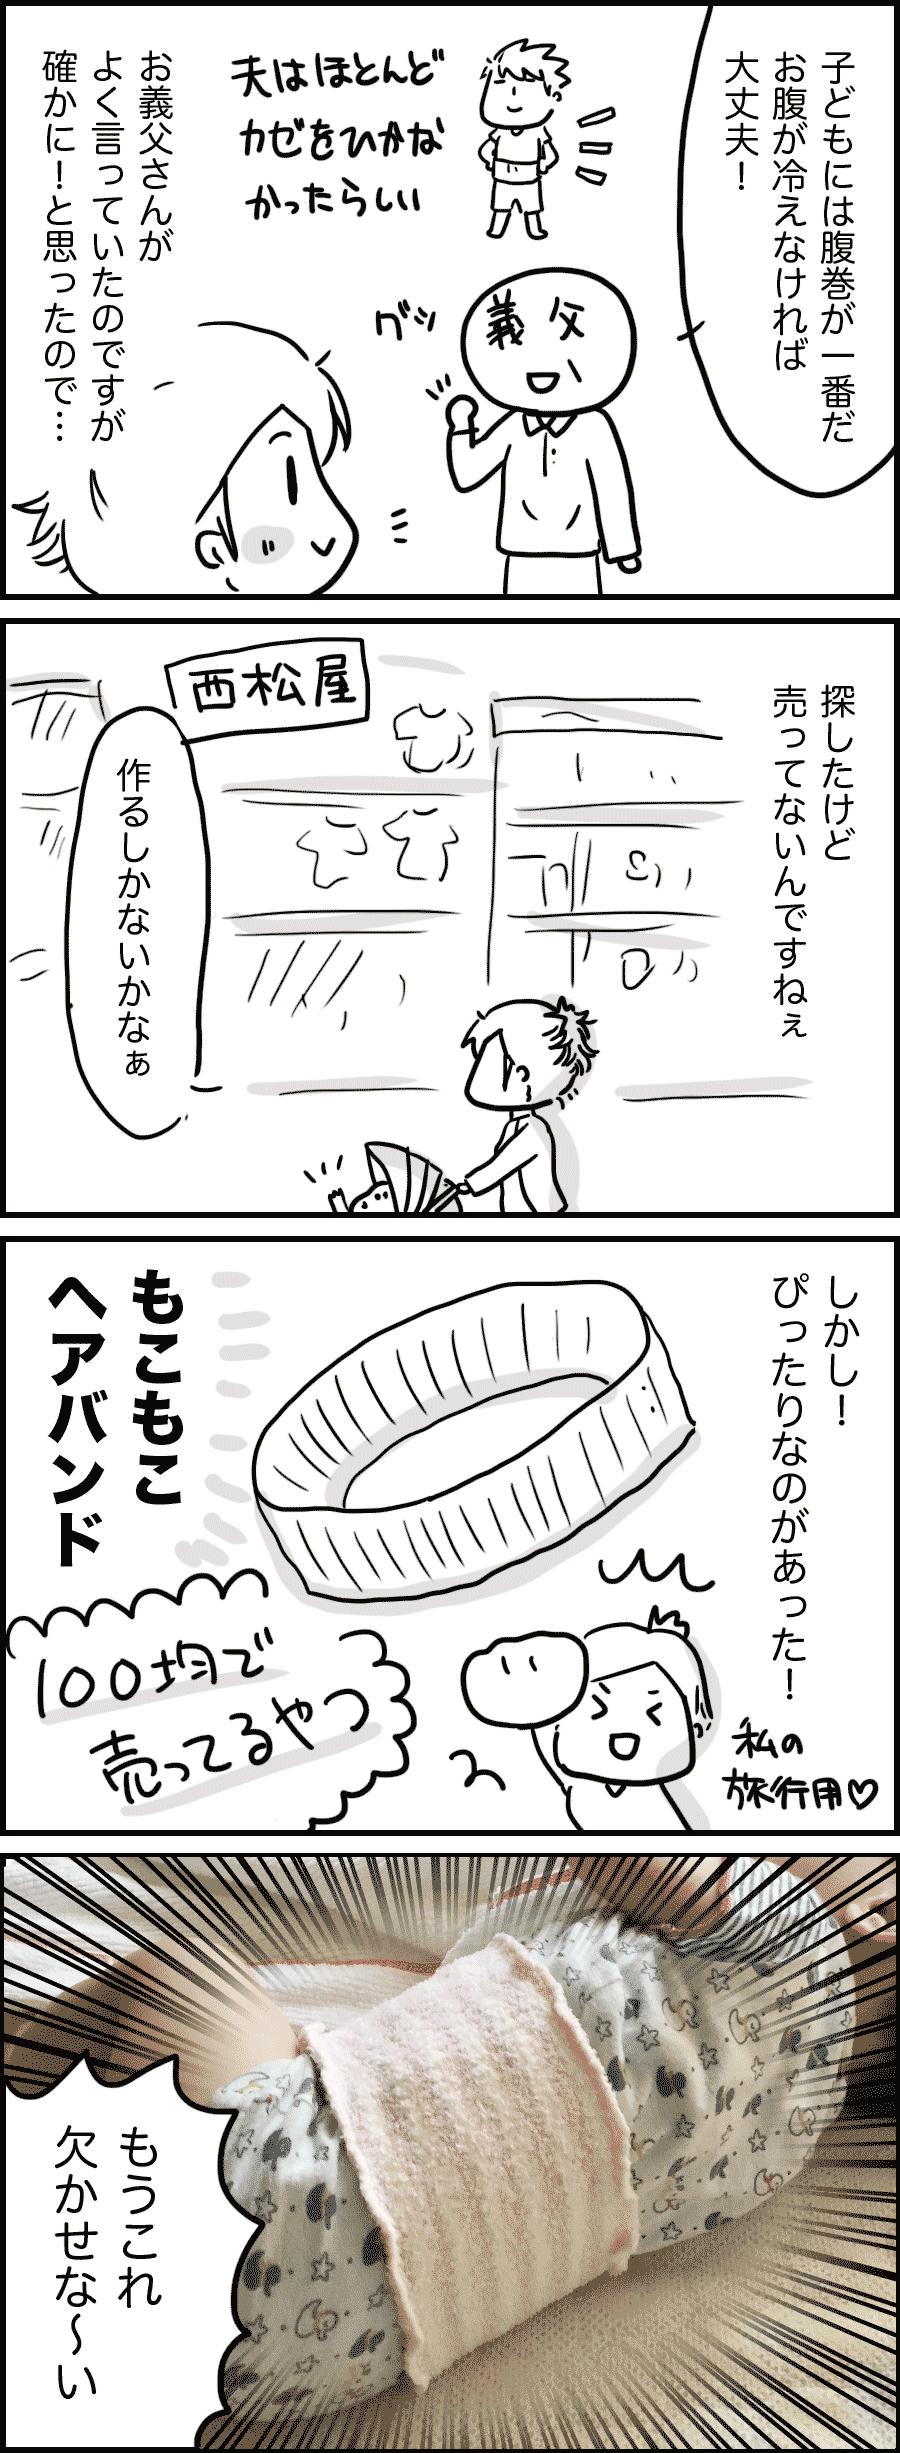 20160928